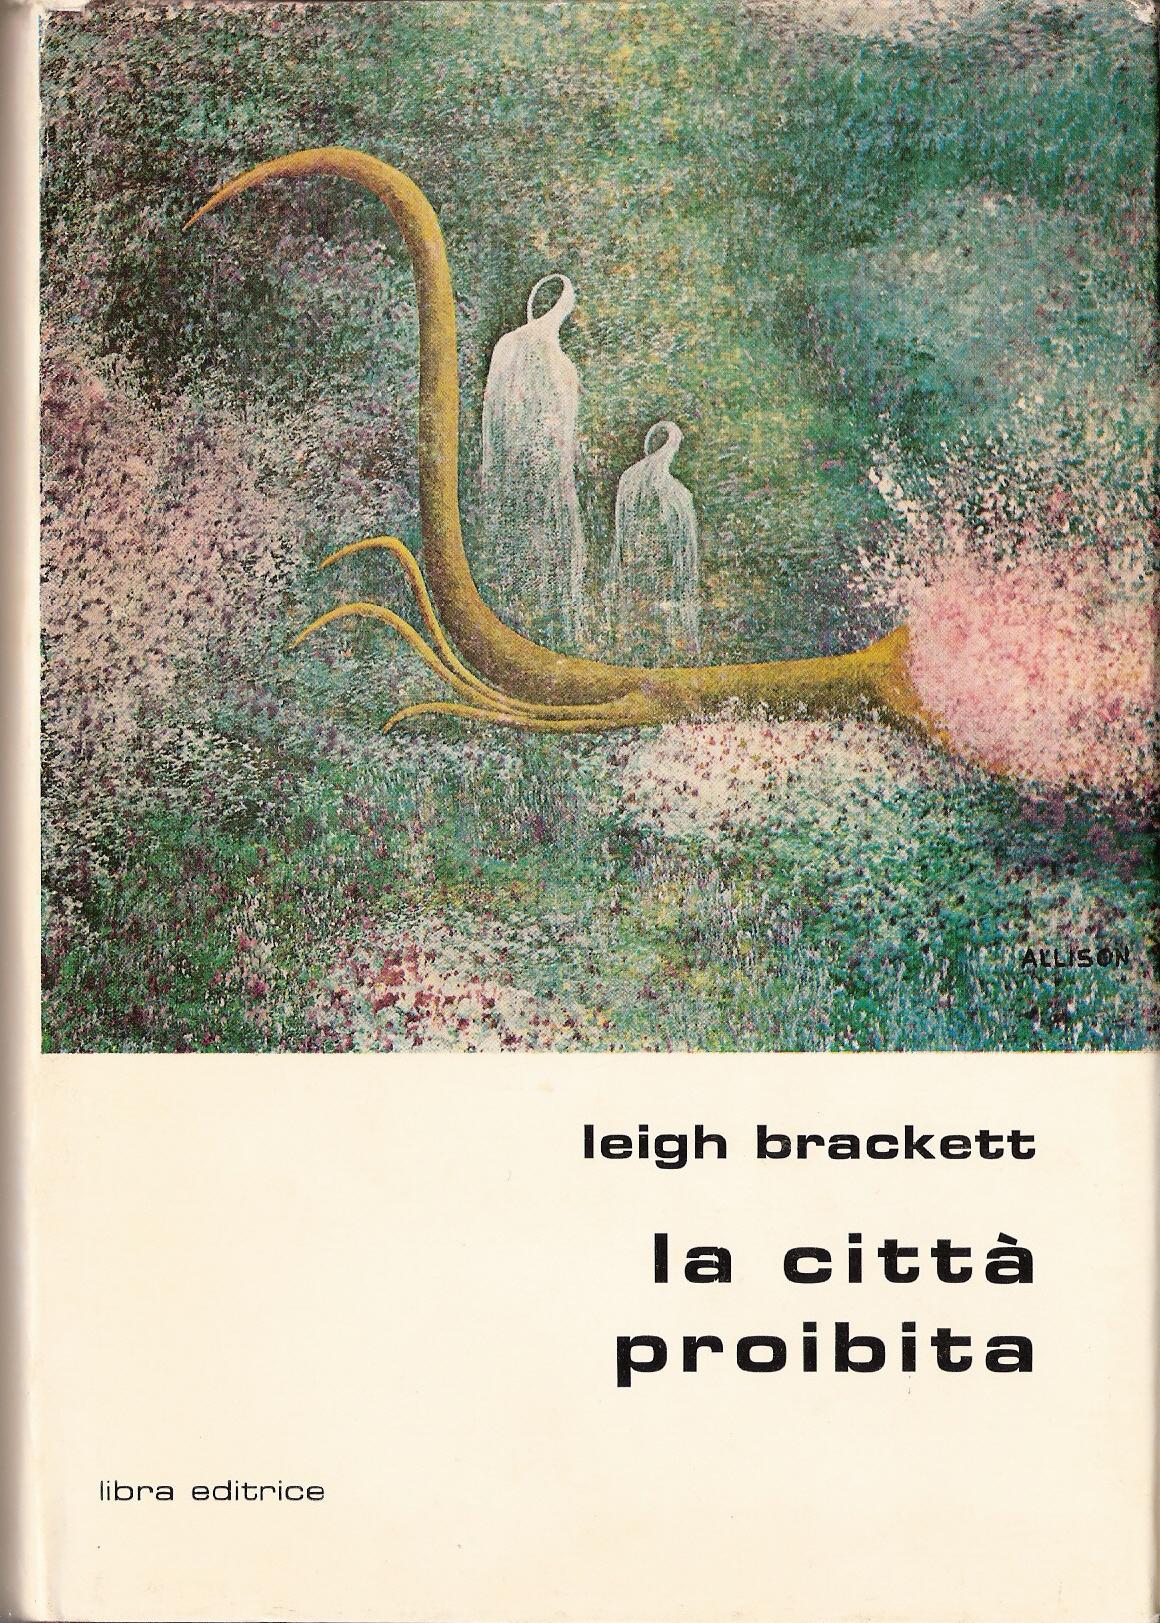 La città proibita - Leigh Brackett - Anobii